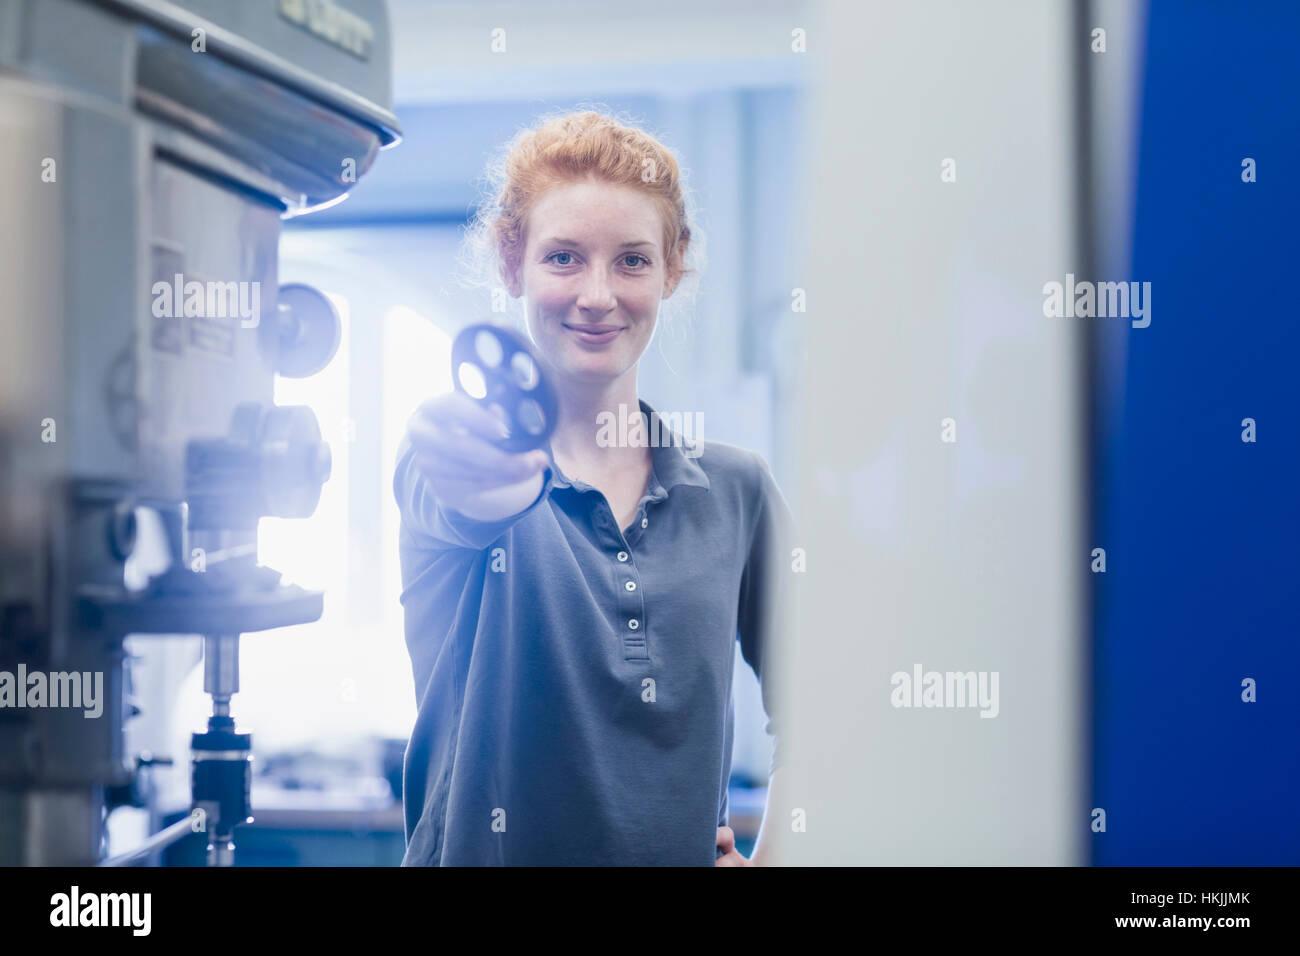 Jeune ingénieur femelle holding pignon dans une installation industrielle, Freiburg im Breisgau, Bade-Wurtemberg, Photo Stock